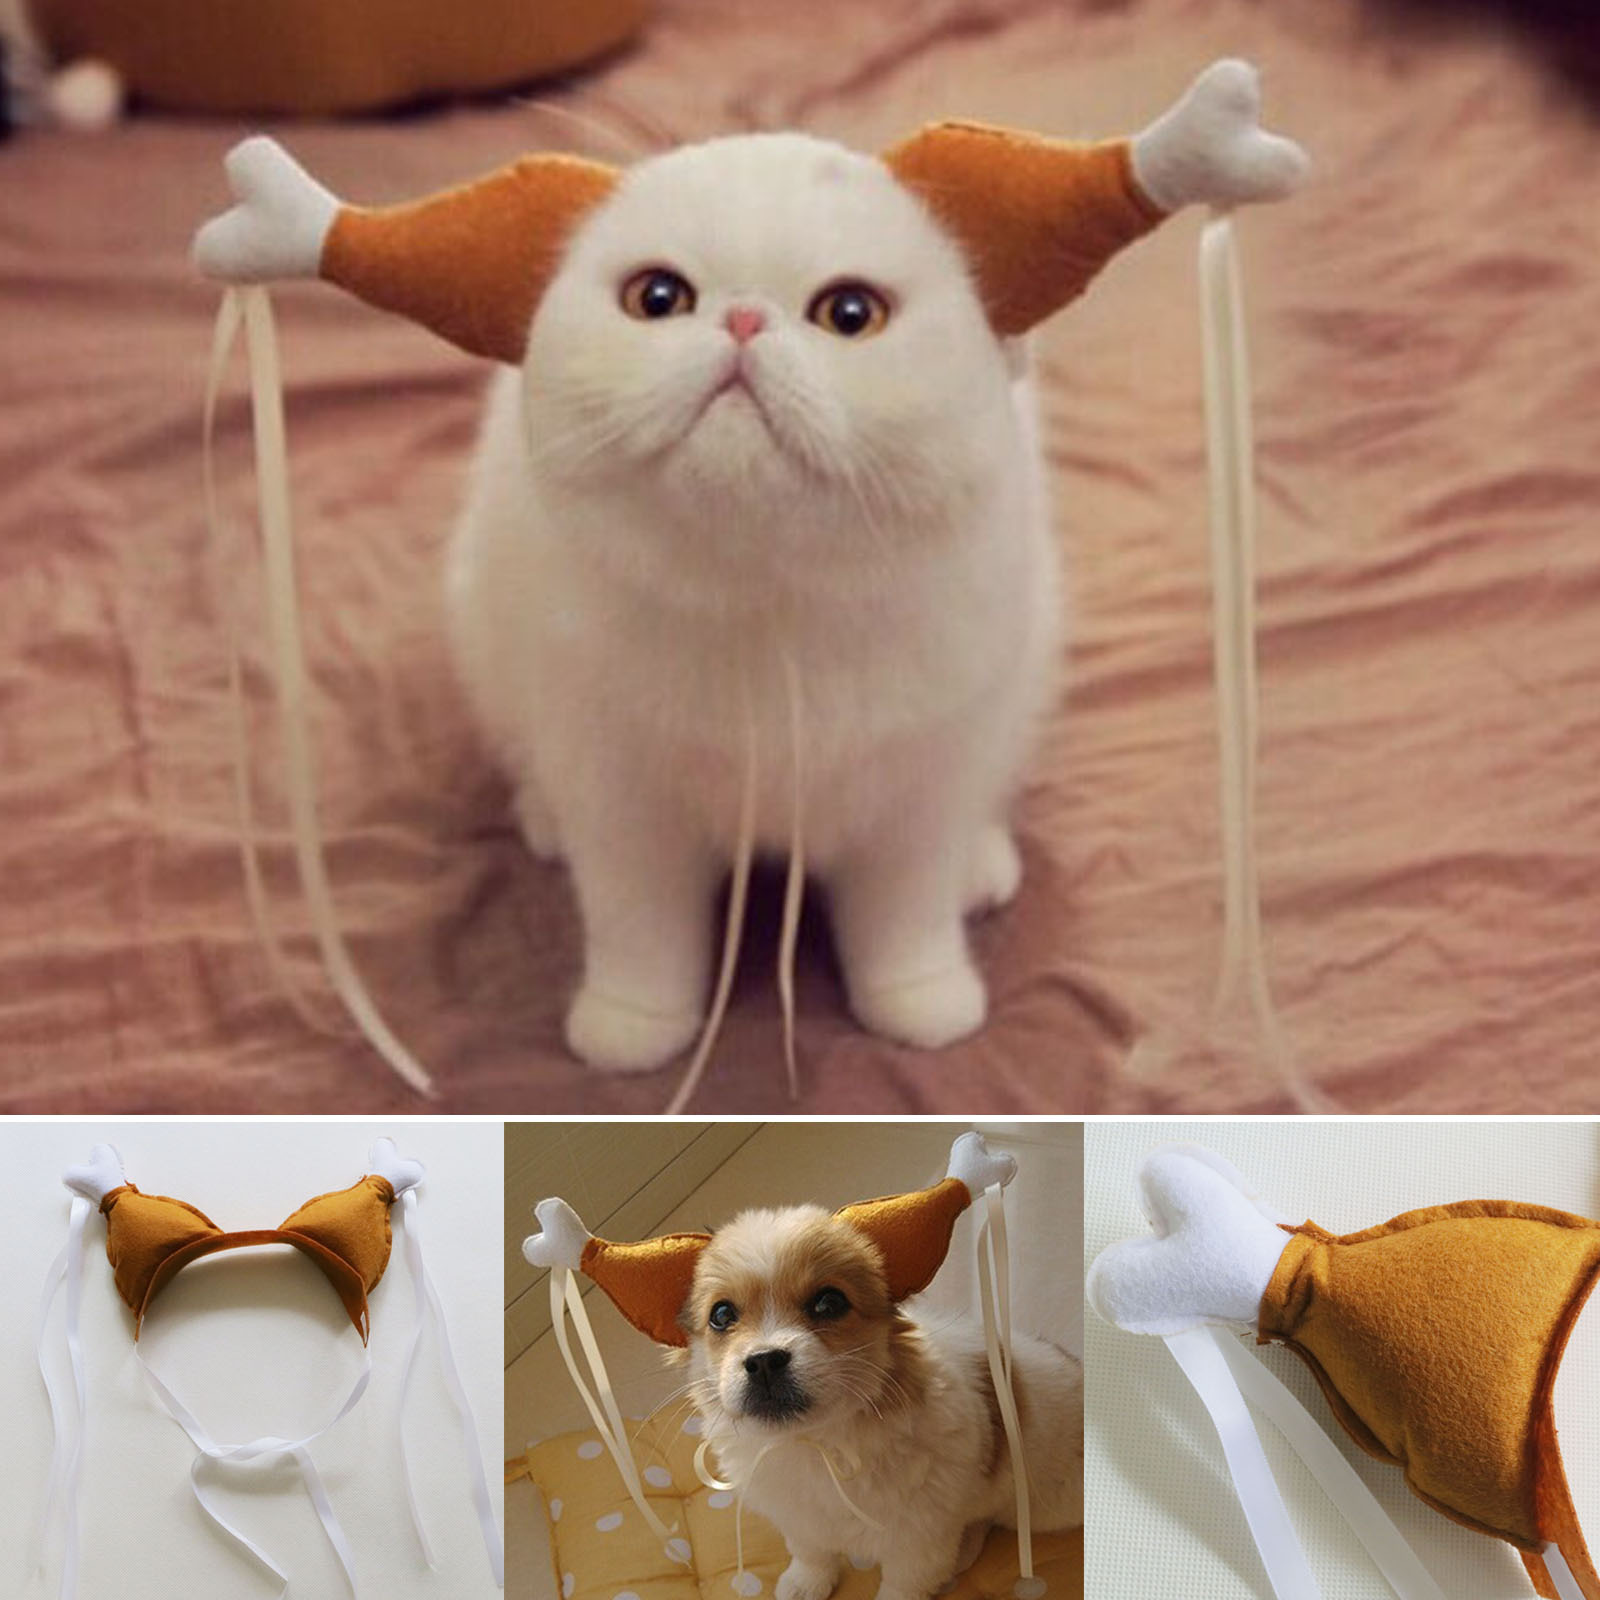 Turkey Chicken Drumstick Headband Dog Cat Headdress Funny Accessories Costumes | eBay & Turkey Chicken Drumstick Headband Dog Cat Headdress Funny ...